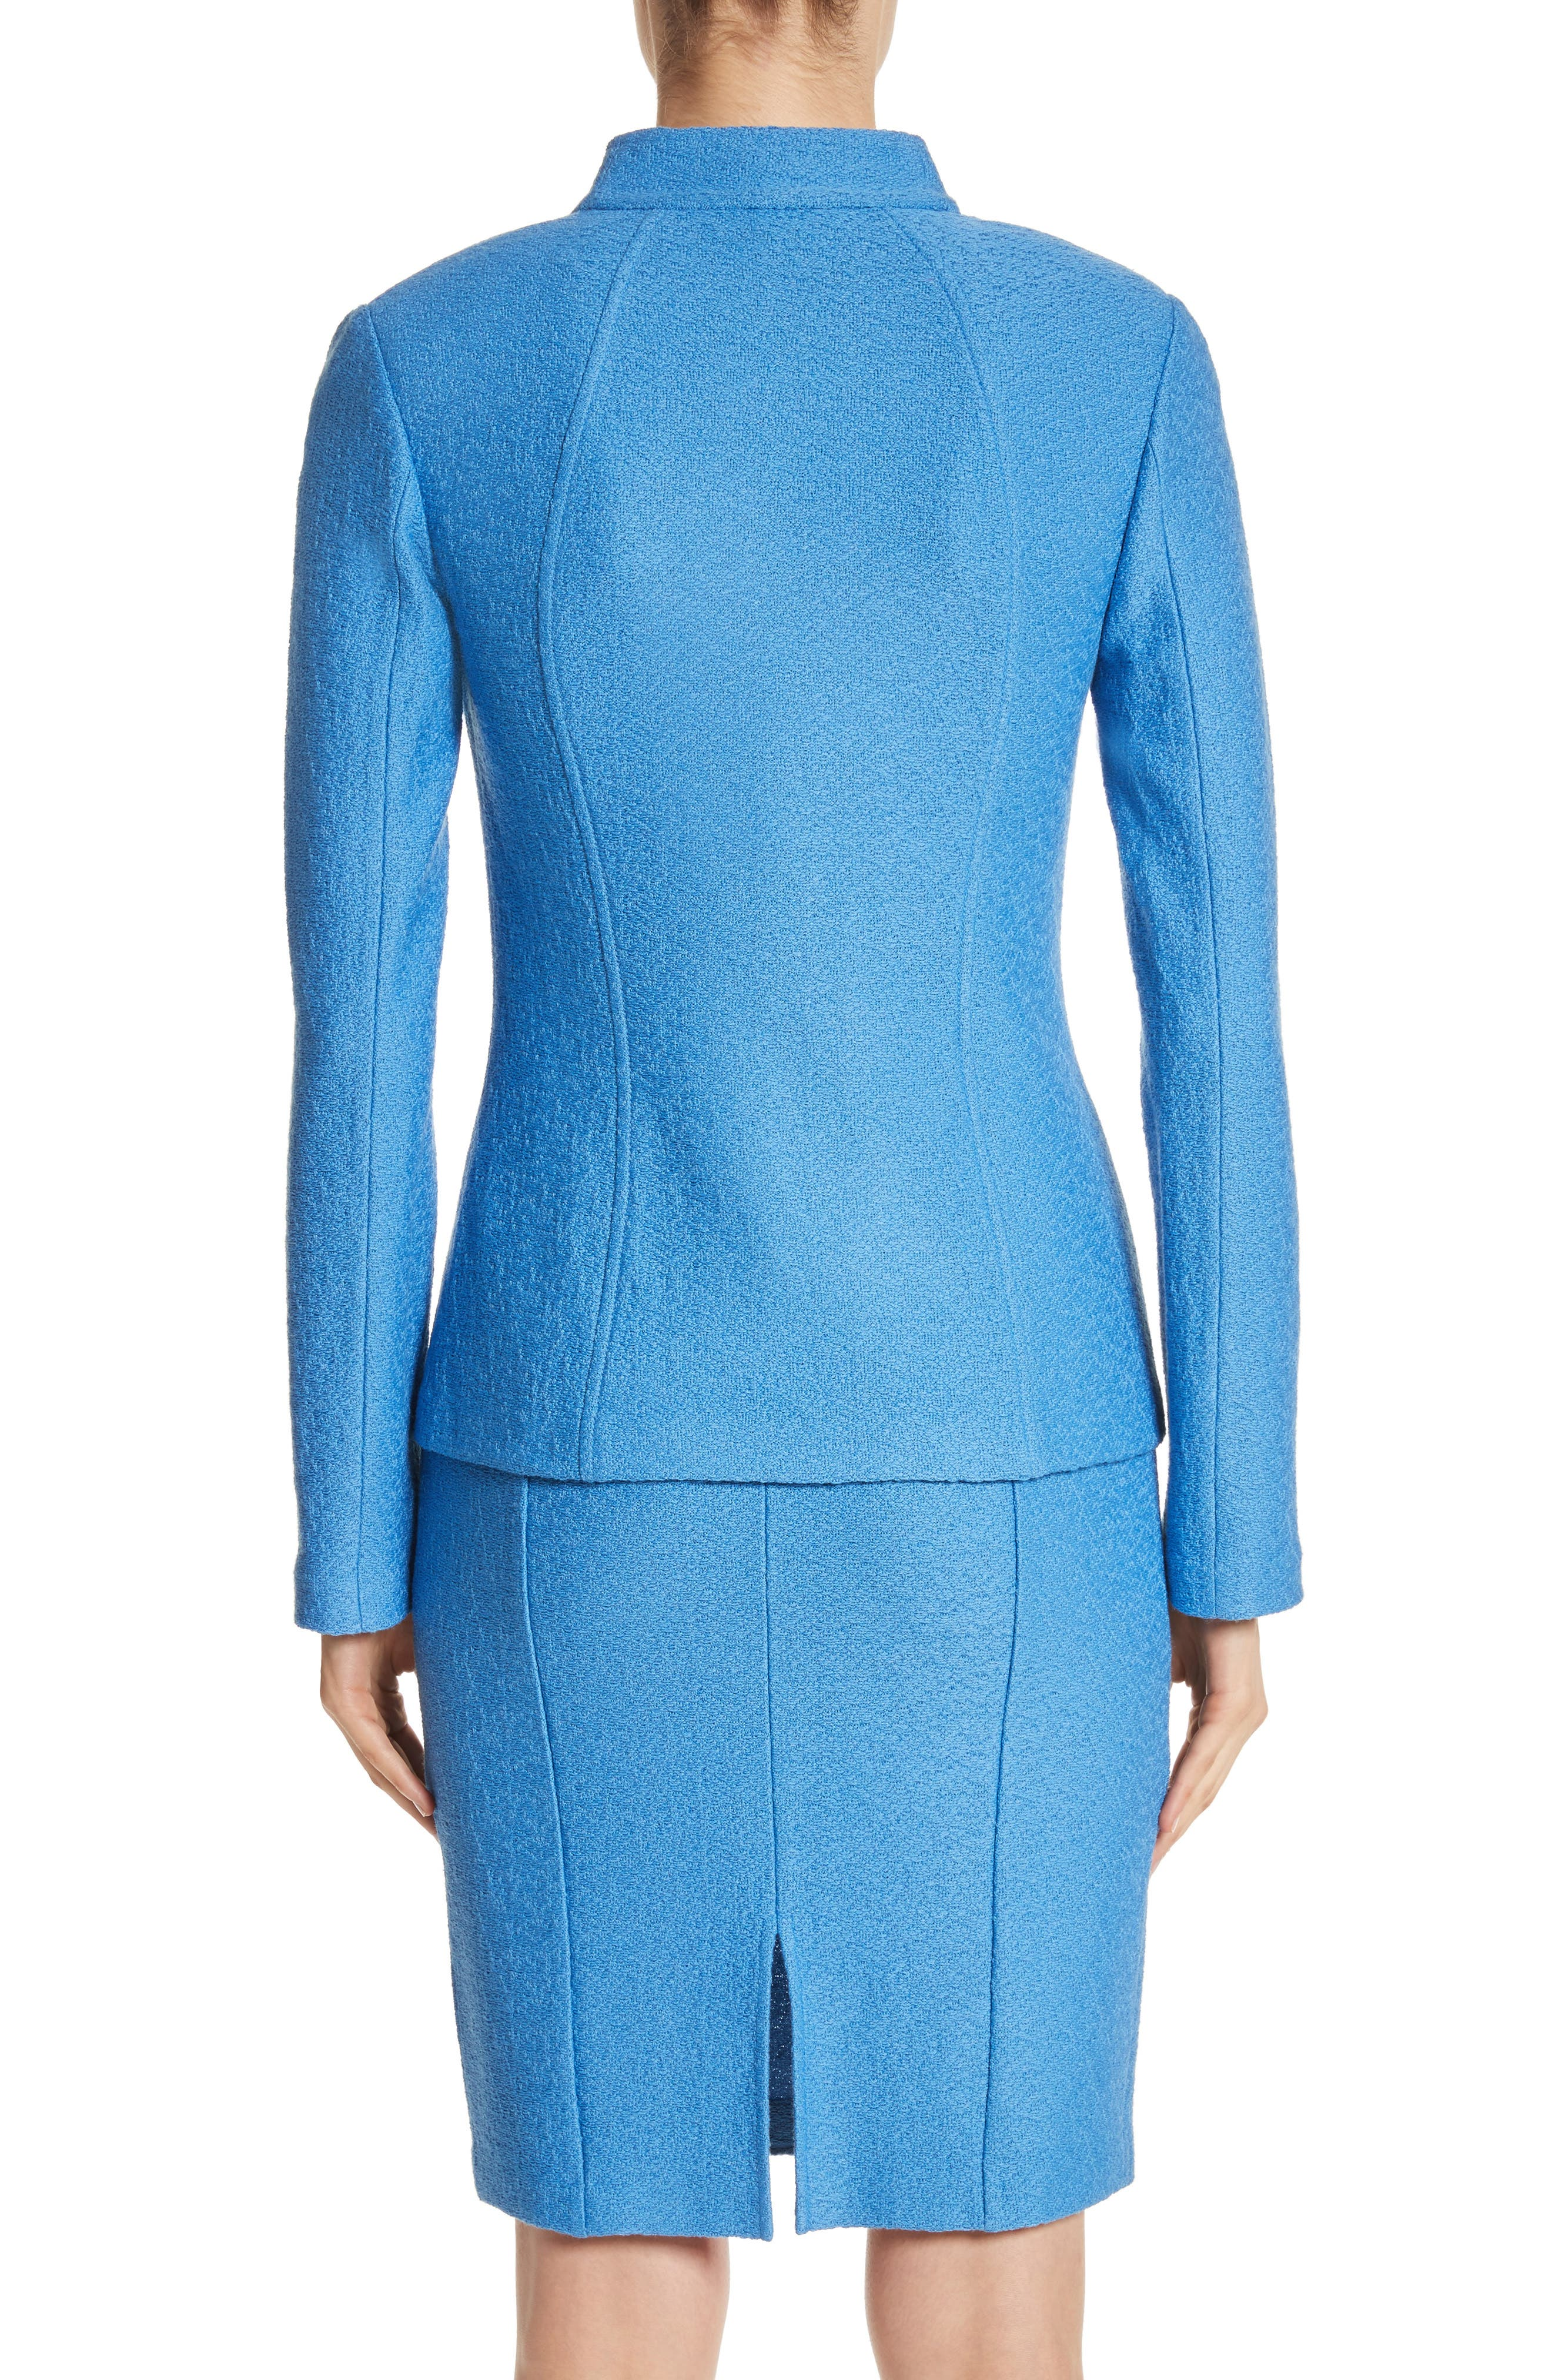 Hannah Knit Stand Collar Jacket,                             Alternate thumbnail 2, color,                             420